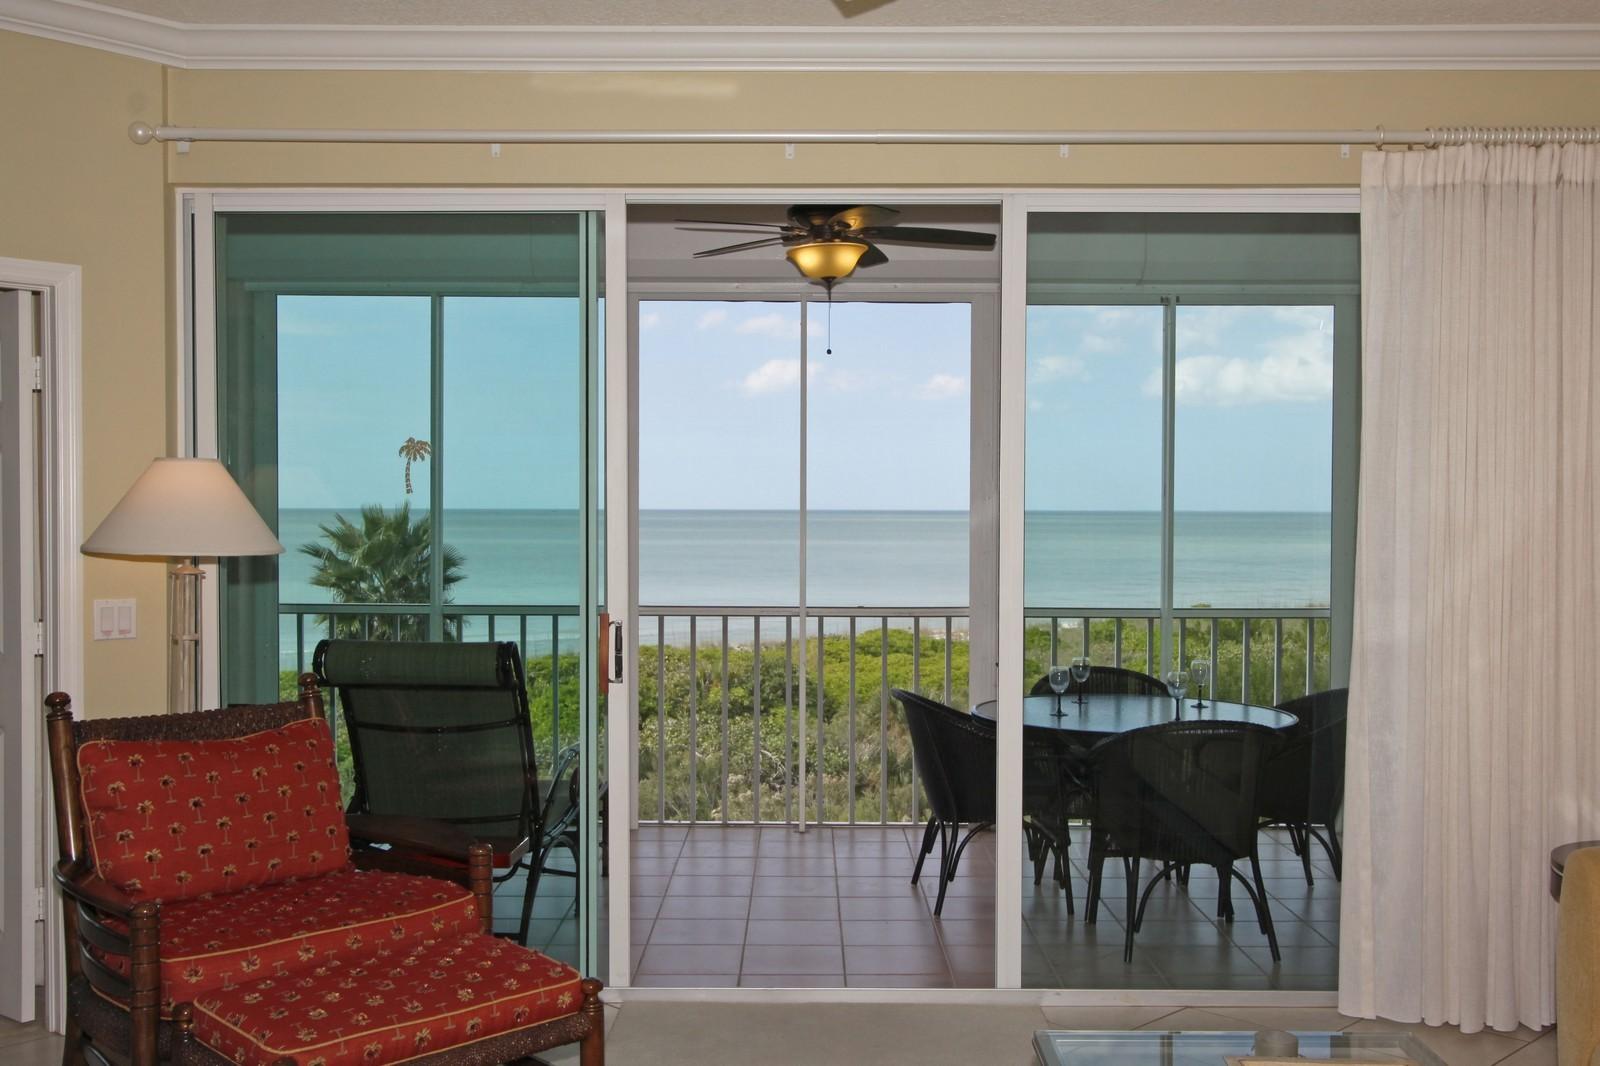 Real Estate Photography - 265 Barefoot Beach, Unit 303, Bonita Springs, FL, 34134 - Living Room / Lanai